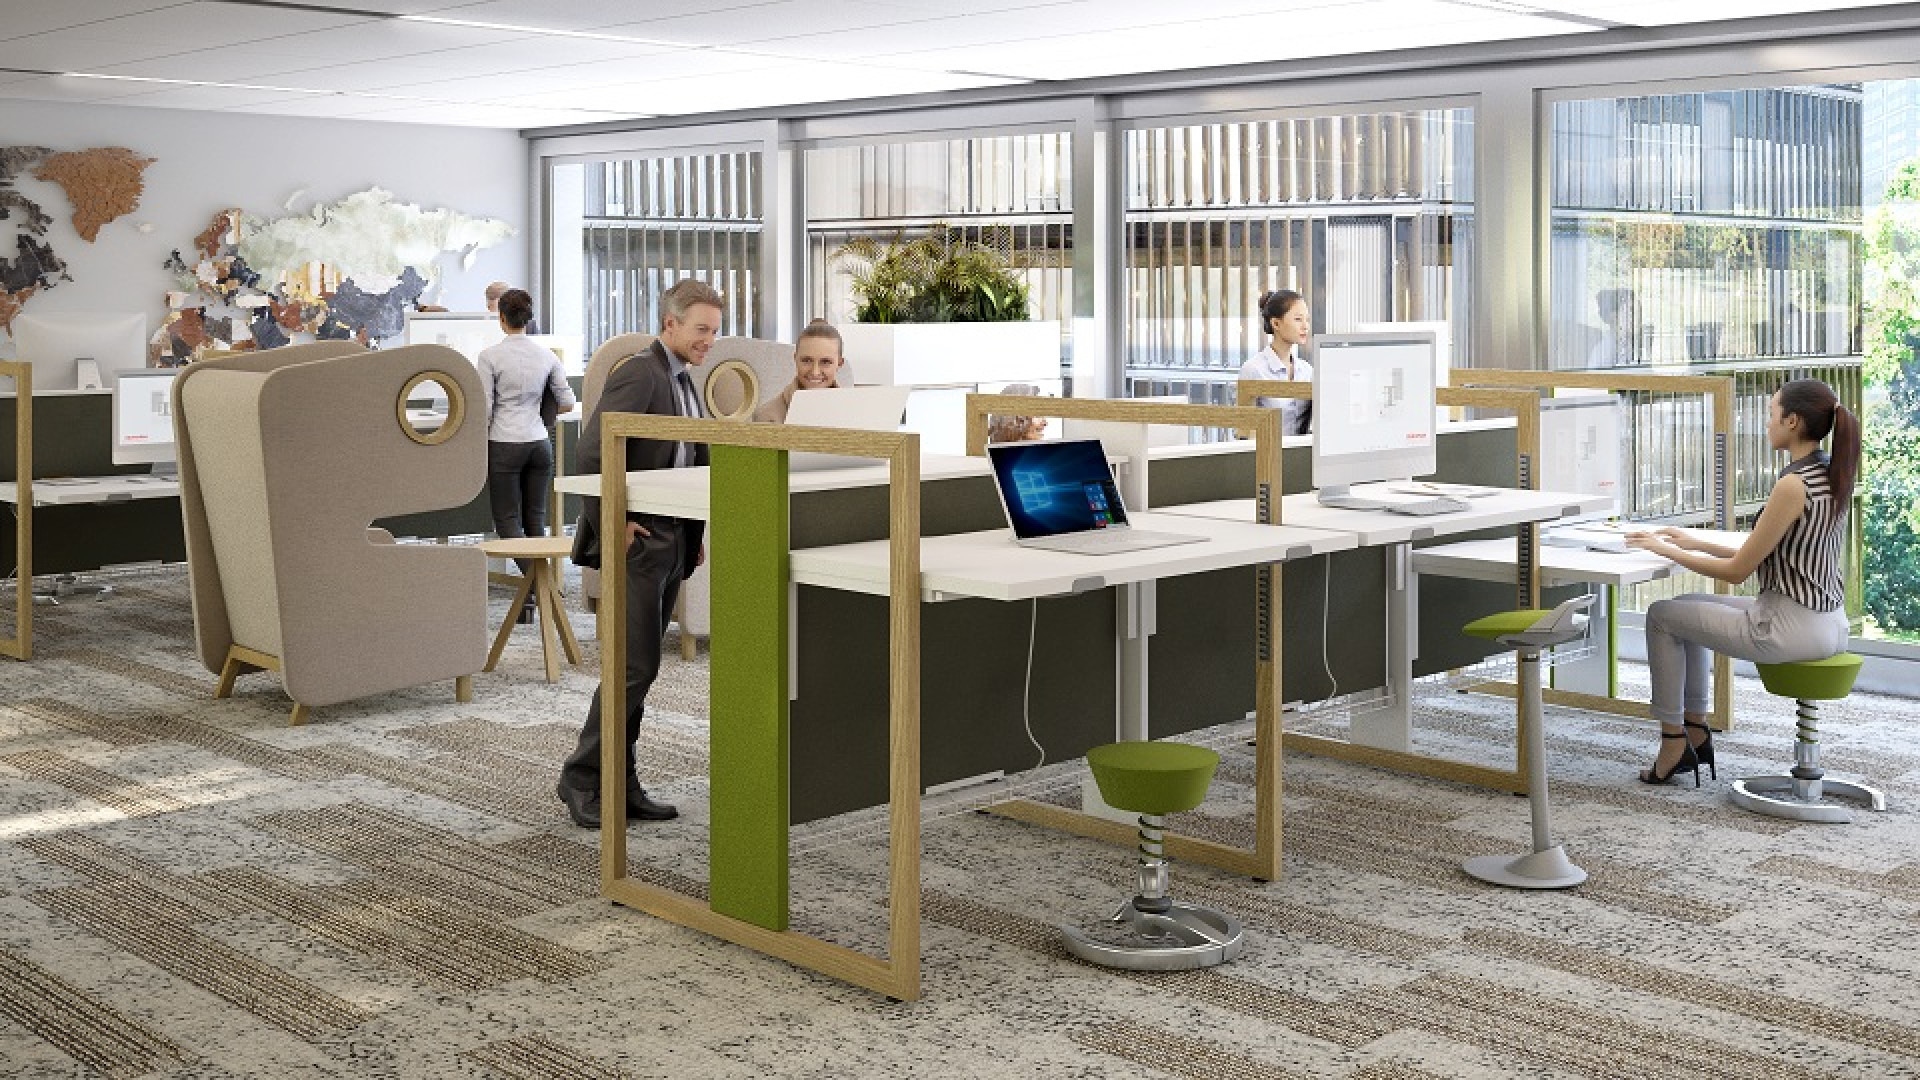 Biurko typu sit&stand Stand Up firmy Mikomax Smart Office. Fot. Mikomax Smart Office